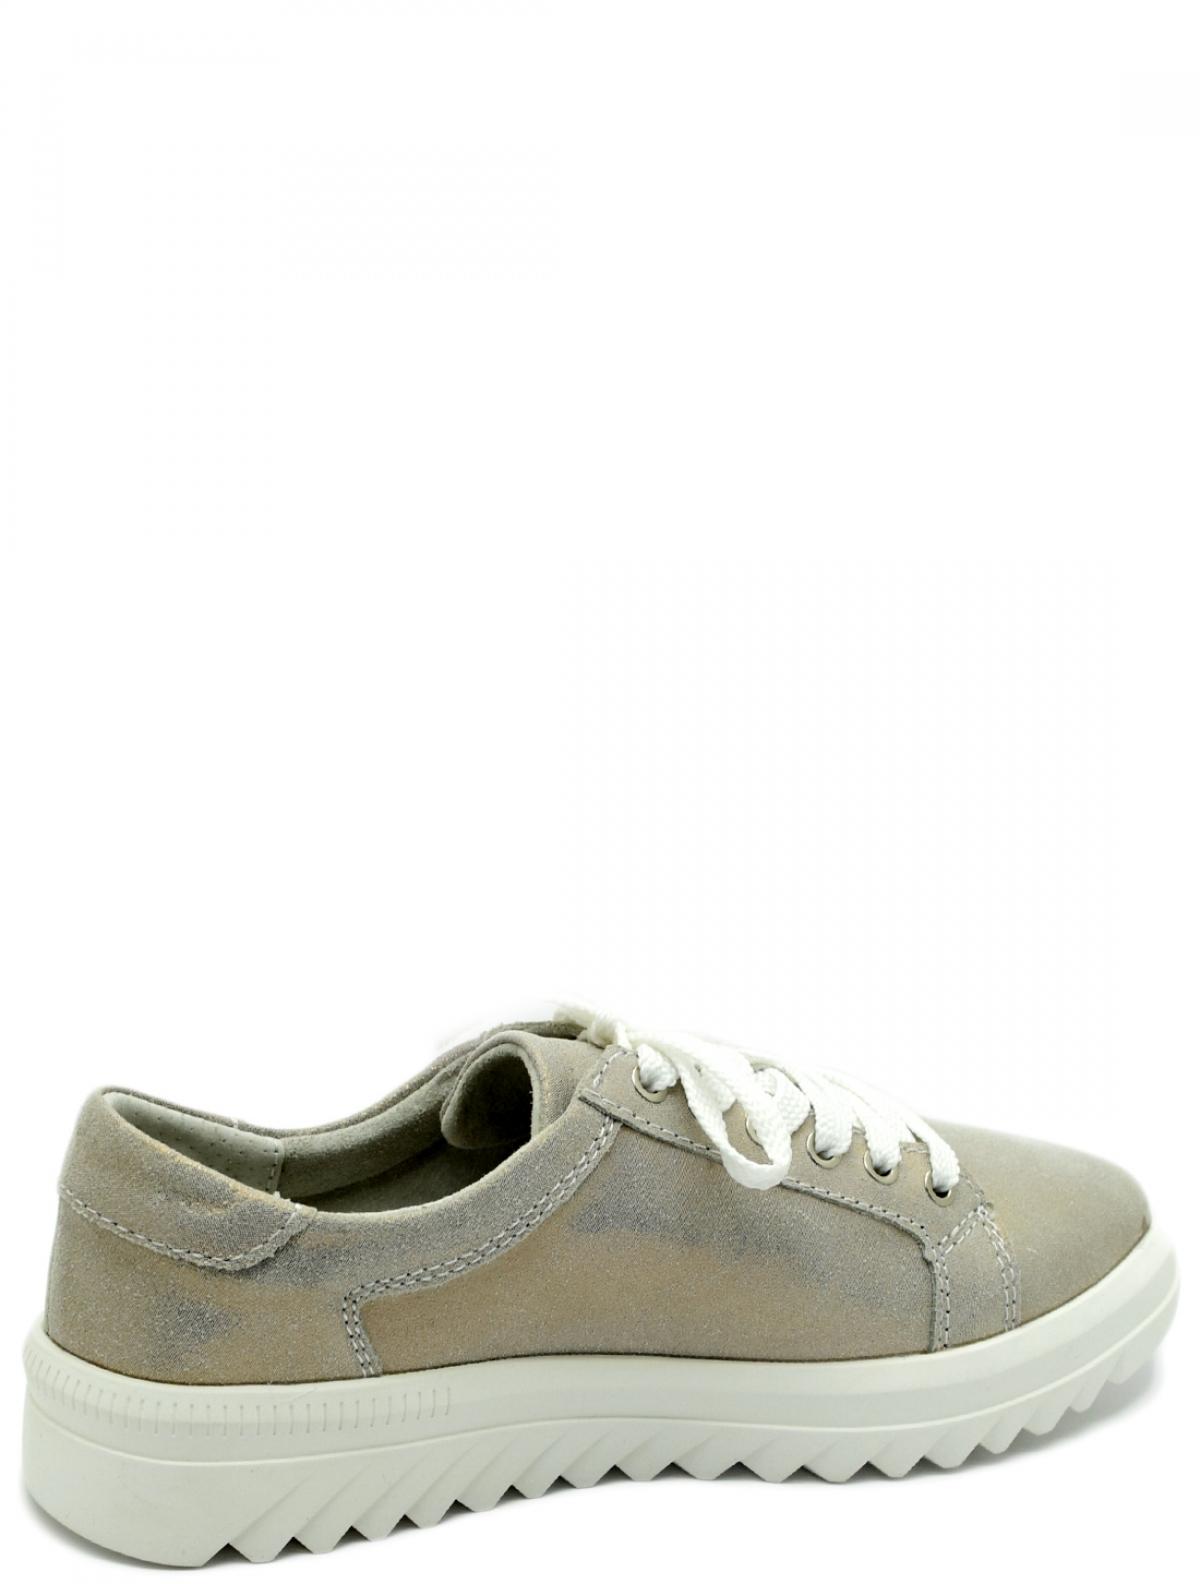 Rio Fiore SW17005 женские кроссовки